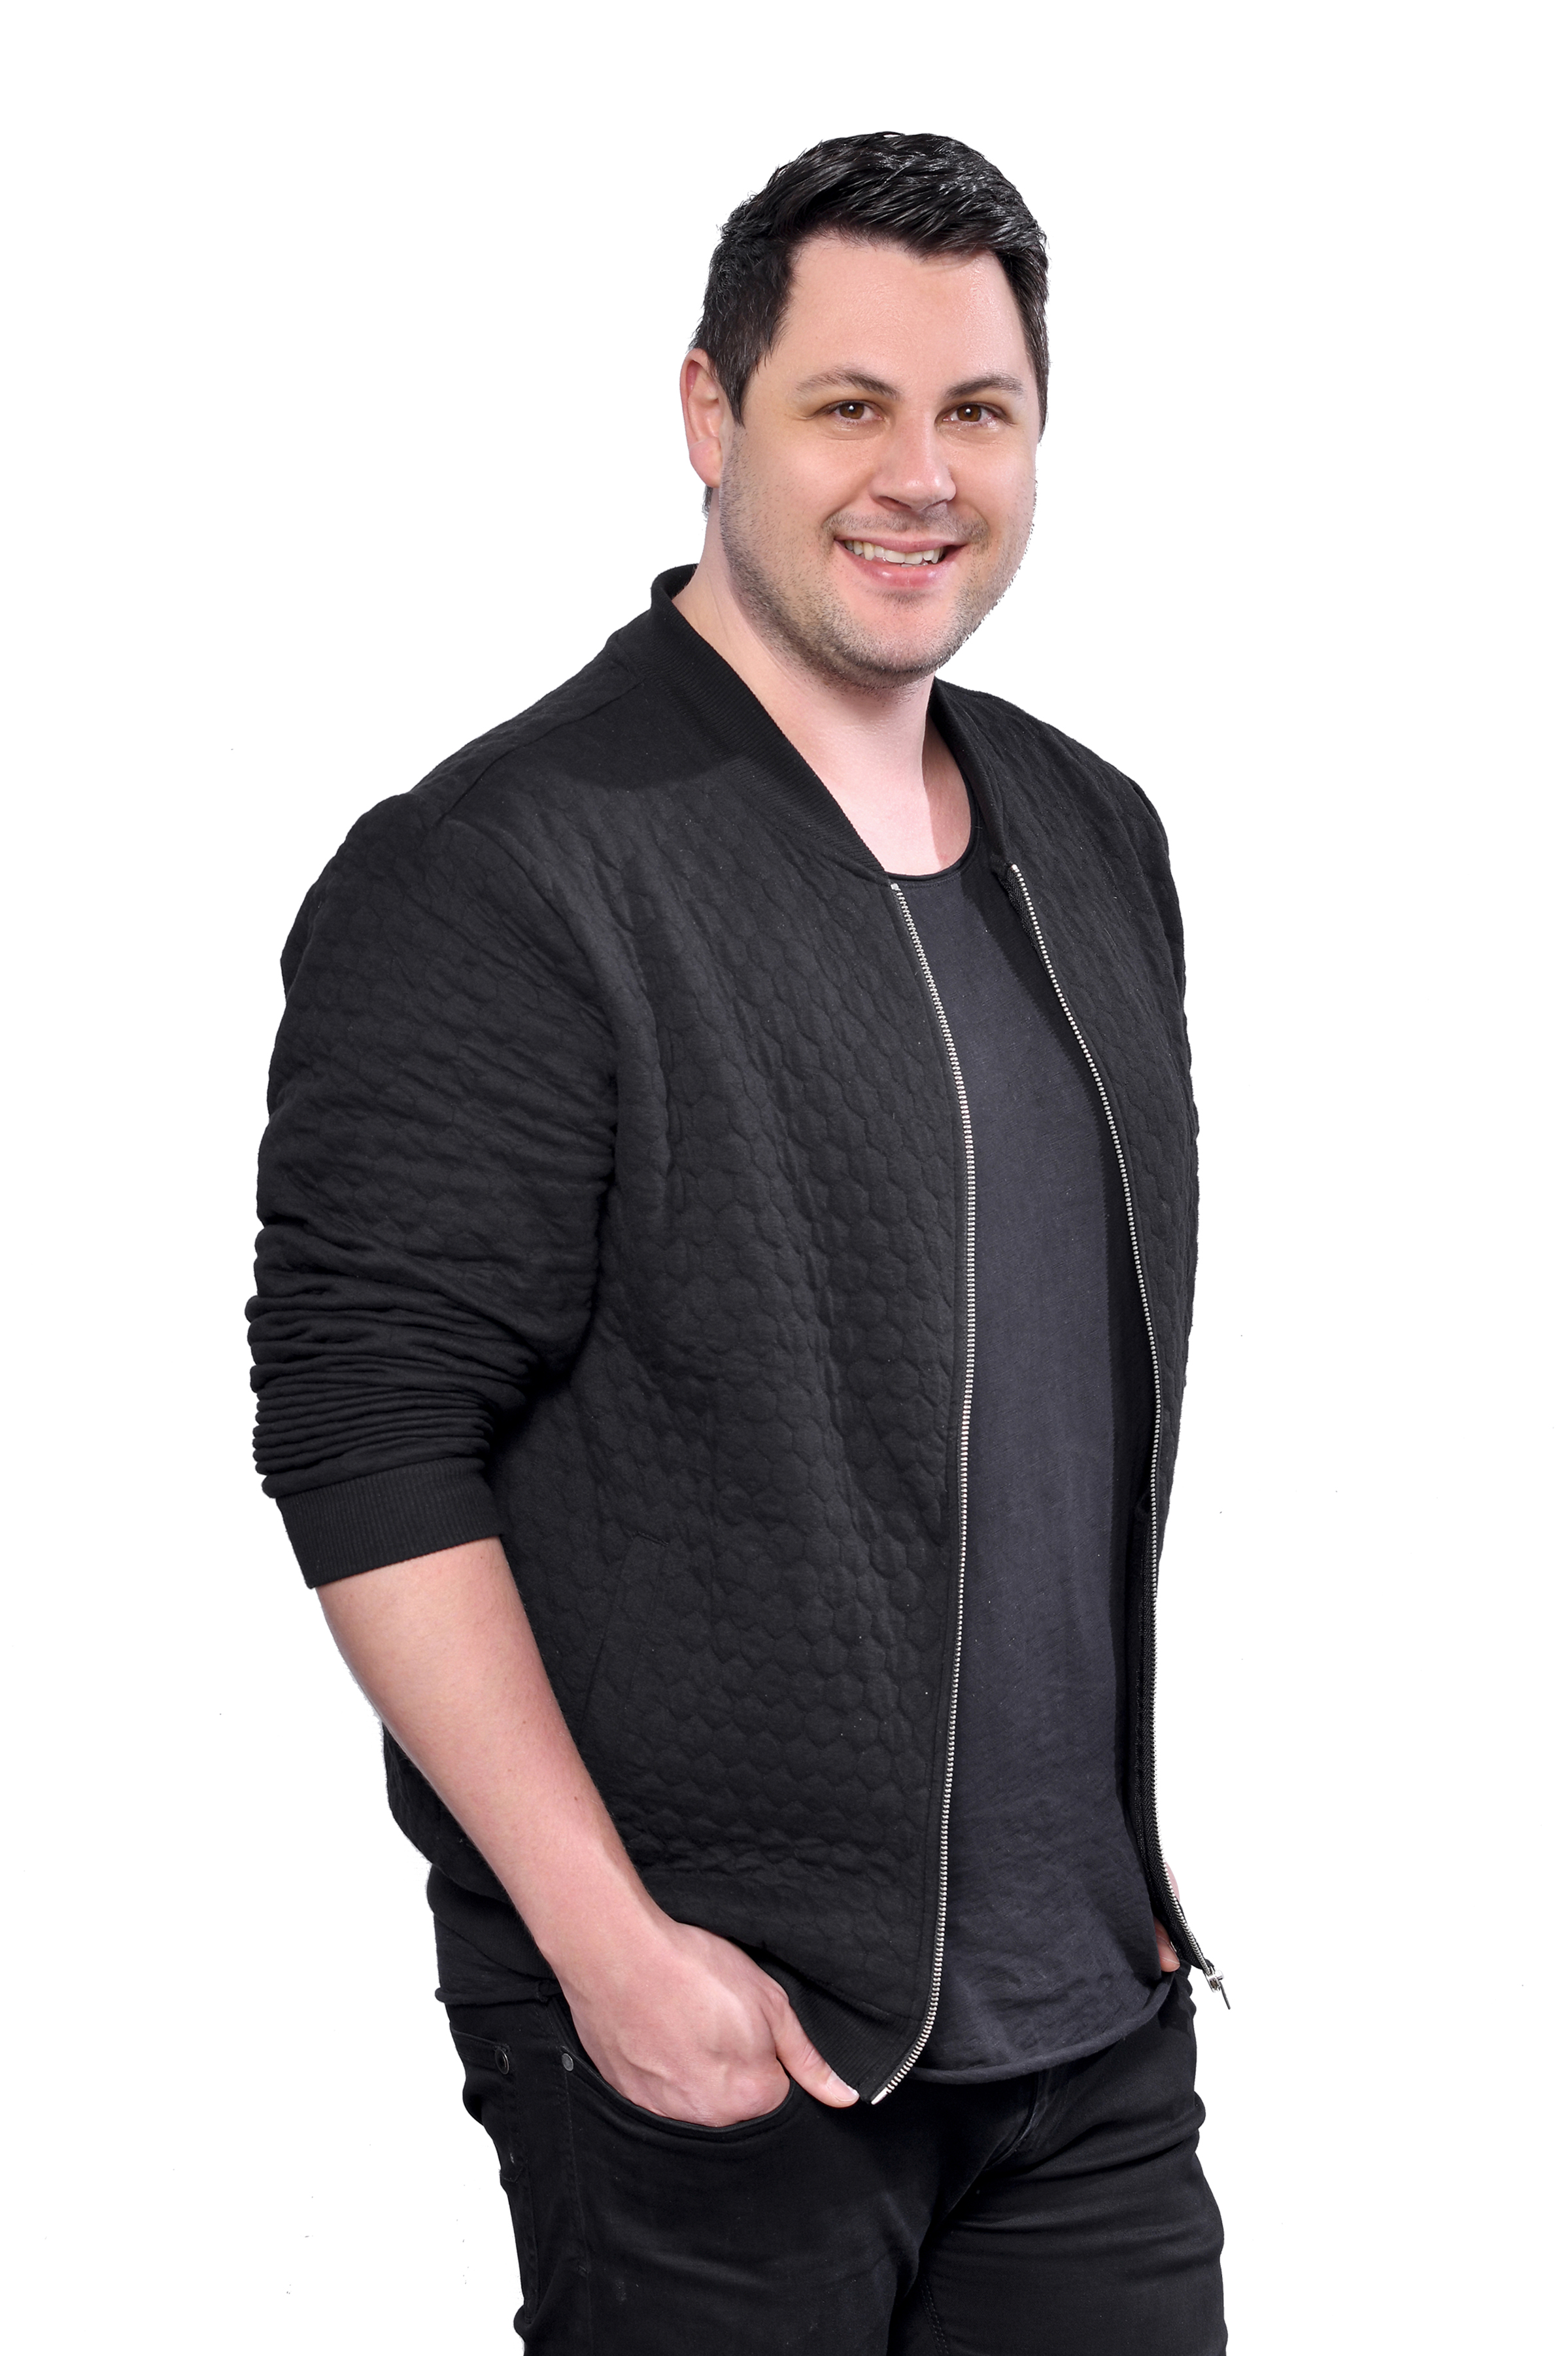 Inhaber Dominik Topp